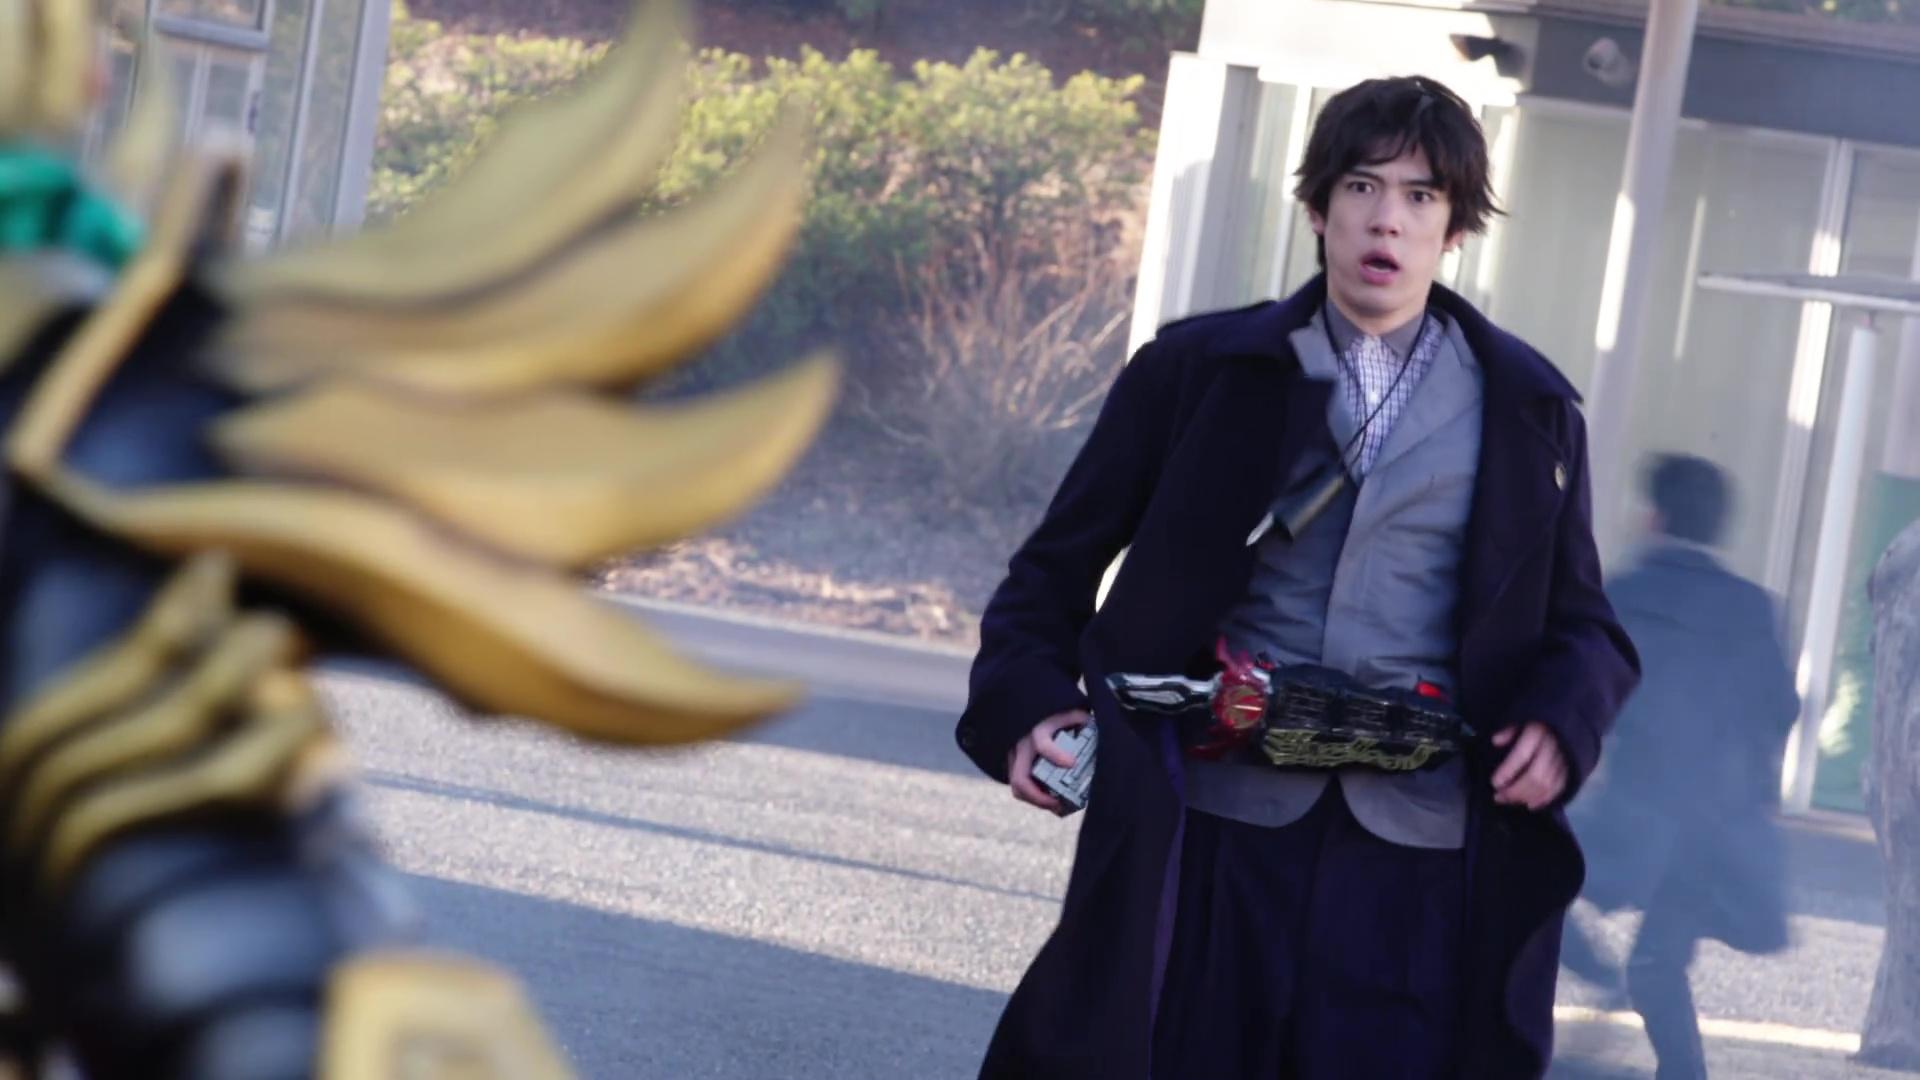 Kamen Rider Saber Episode 27 Recap